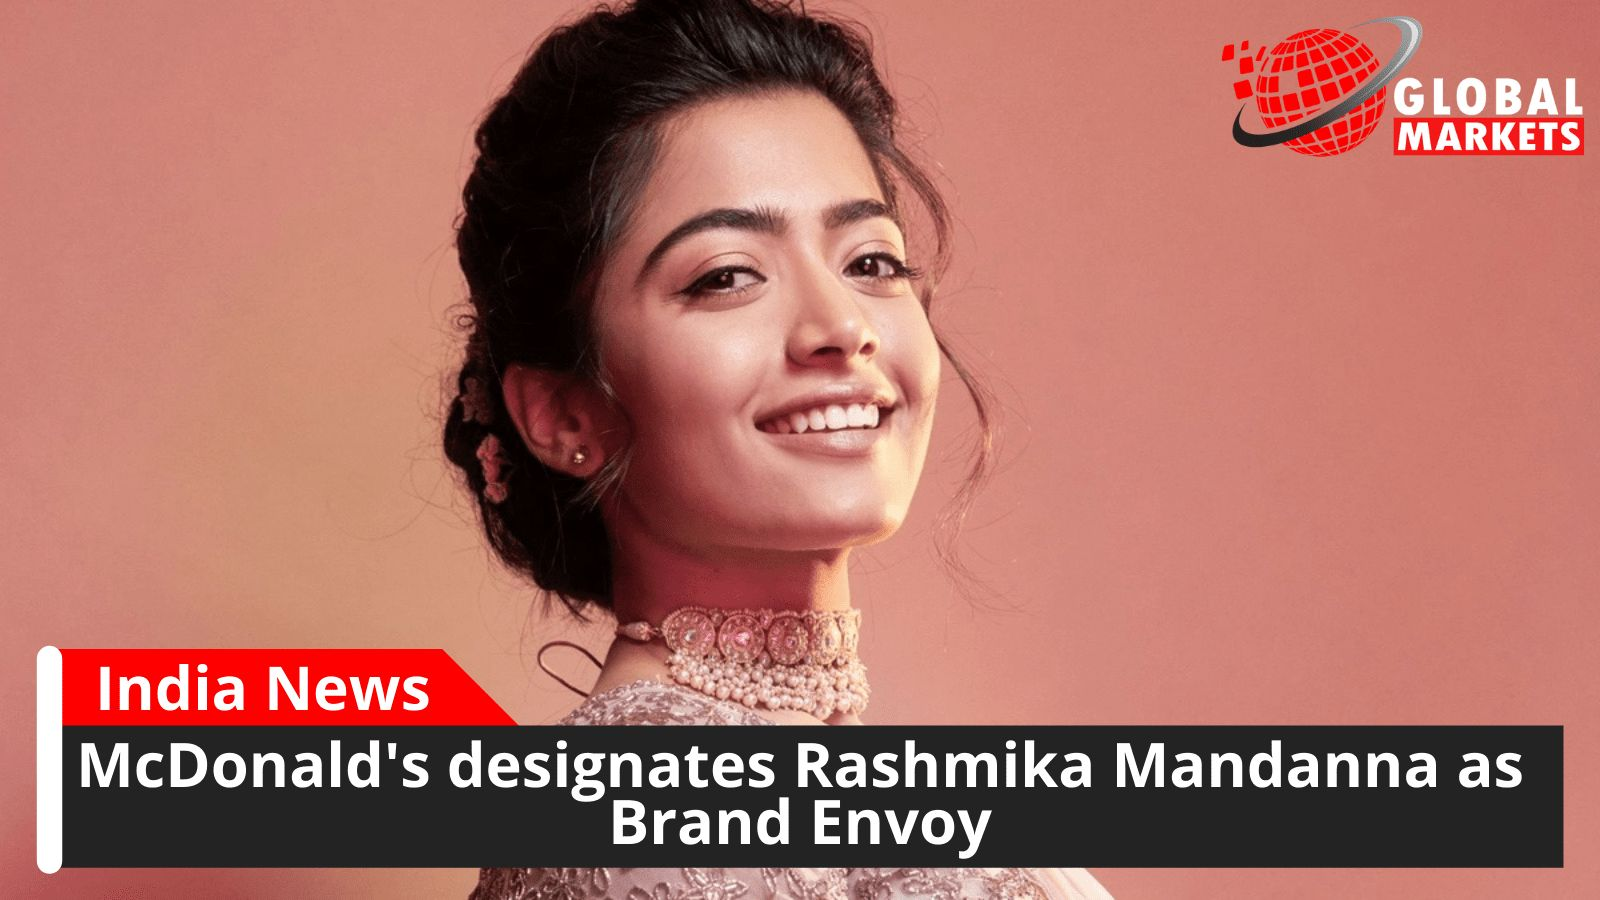 McDonald's designates Rashmika Mandanna as Brand Envoy